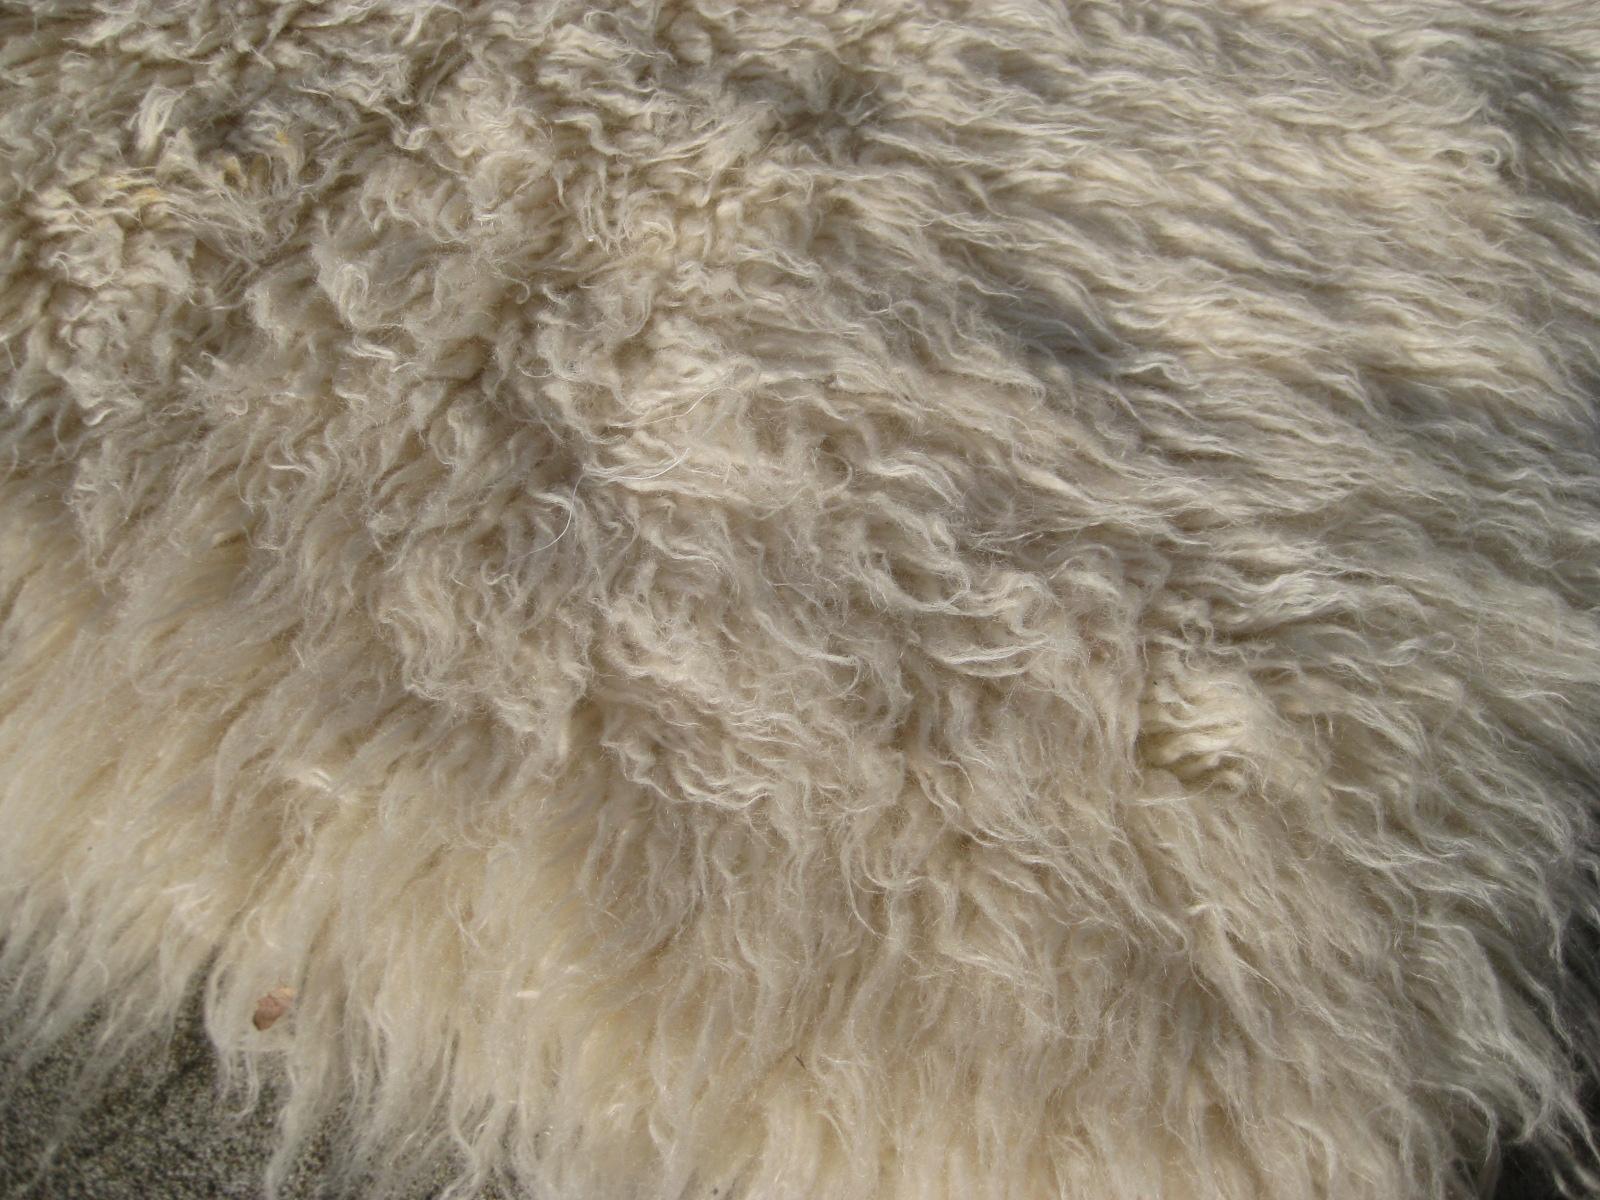 UHURU FURNITURE & COLLECTIBLES: SOLD - Fuzzy Rug (5' X 8 ...